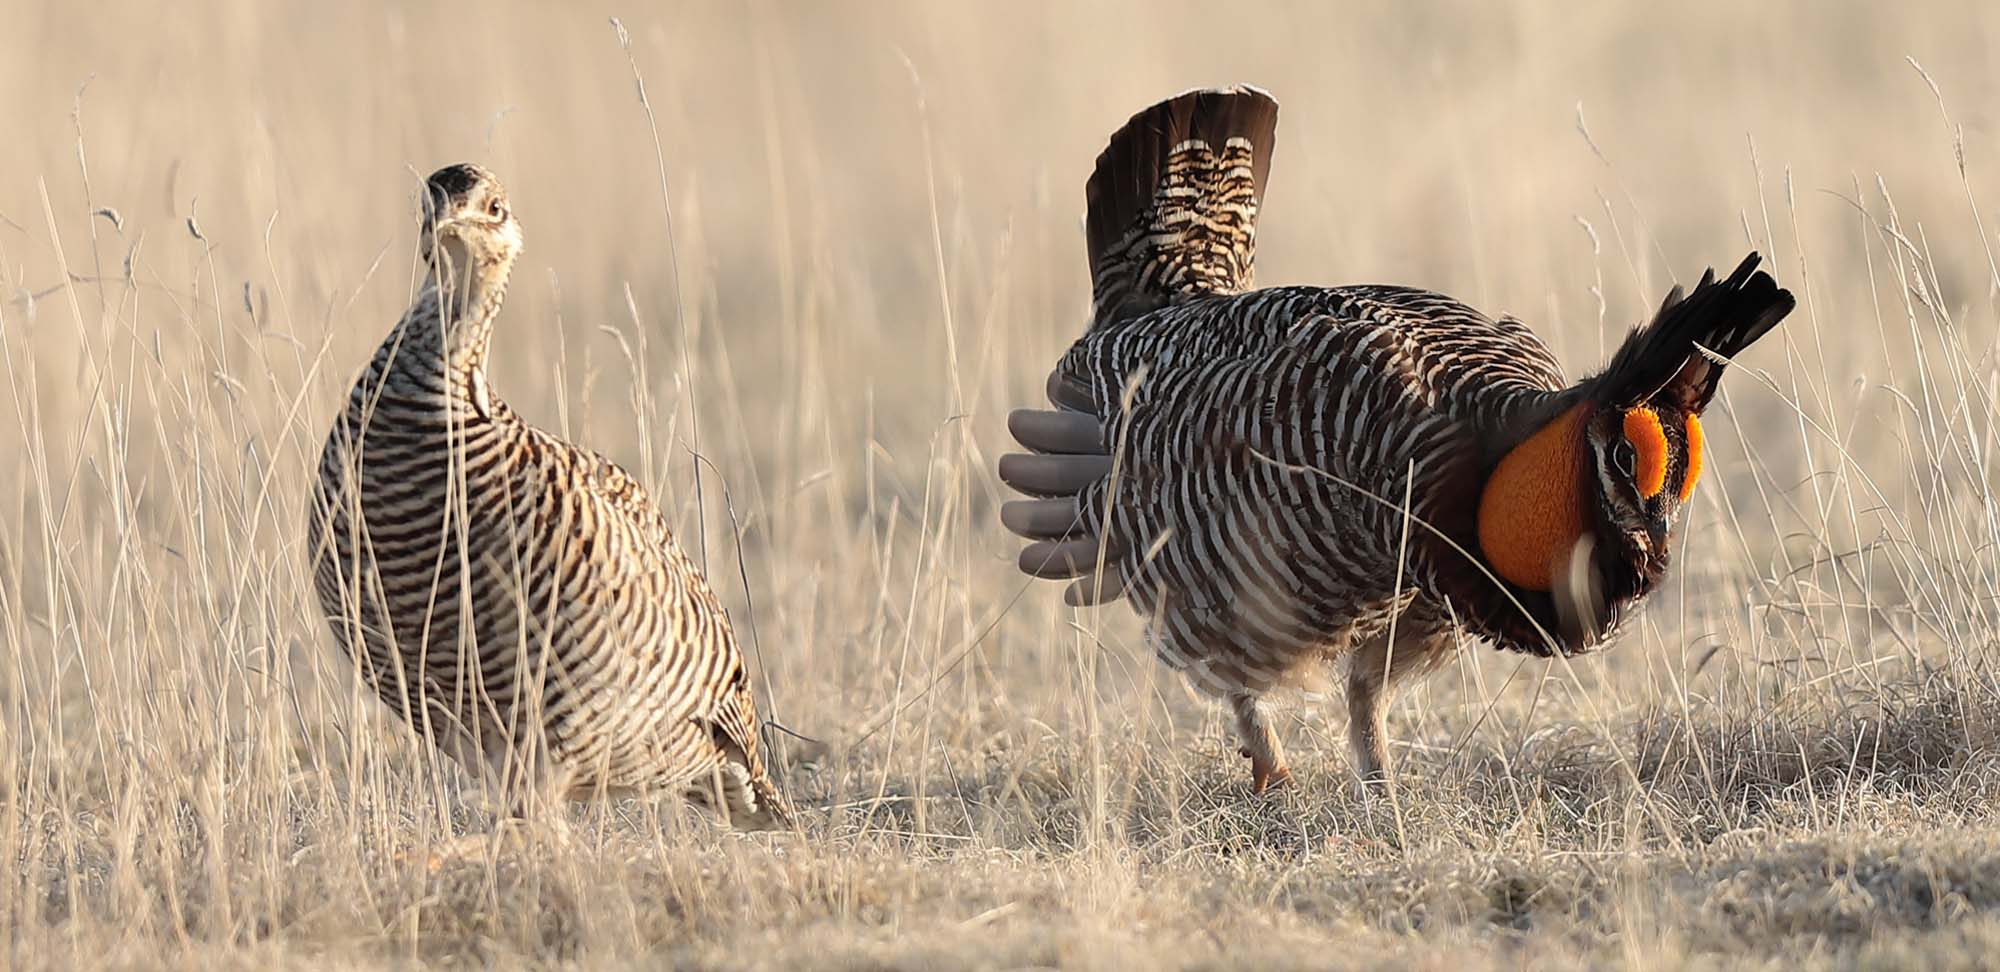 Greater Prairie-Chicken Field Guides Birding Tours COLORADO USA